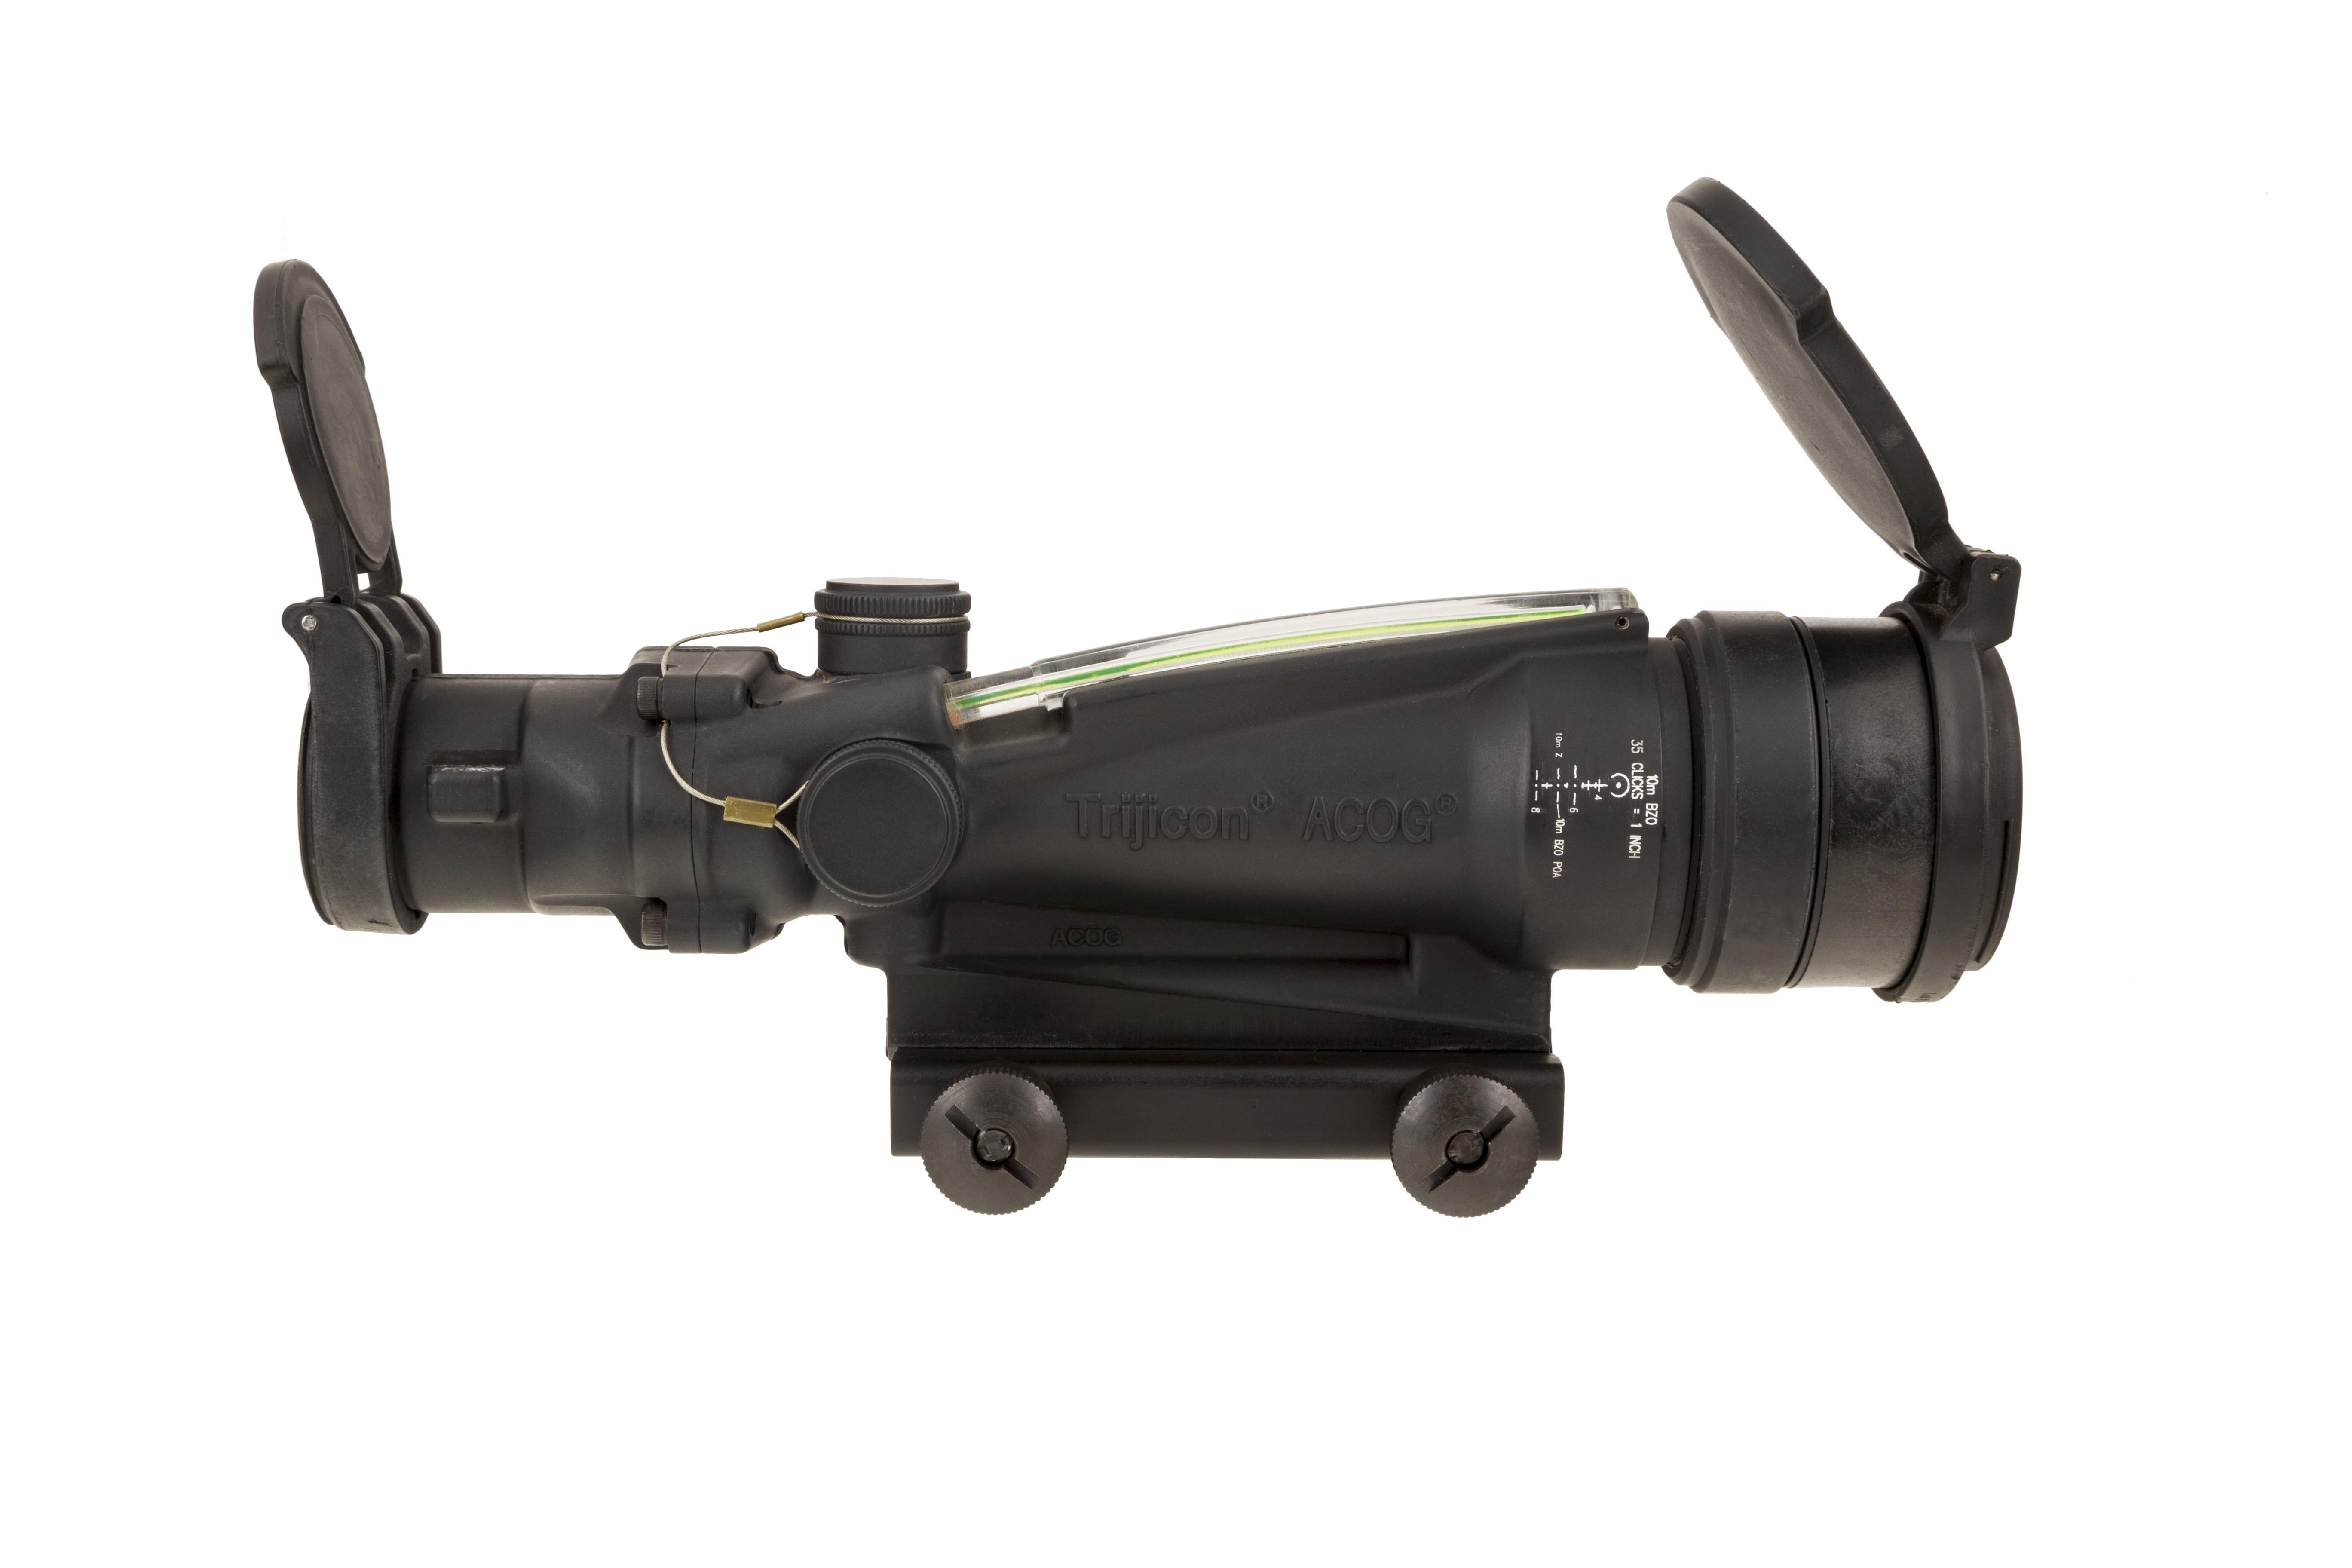 TA11MGO-M249 angle 5